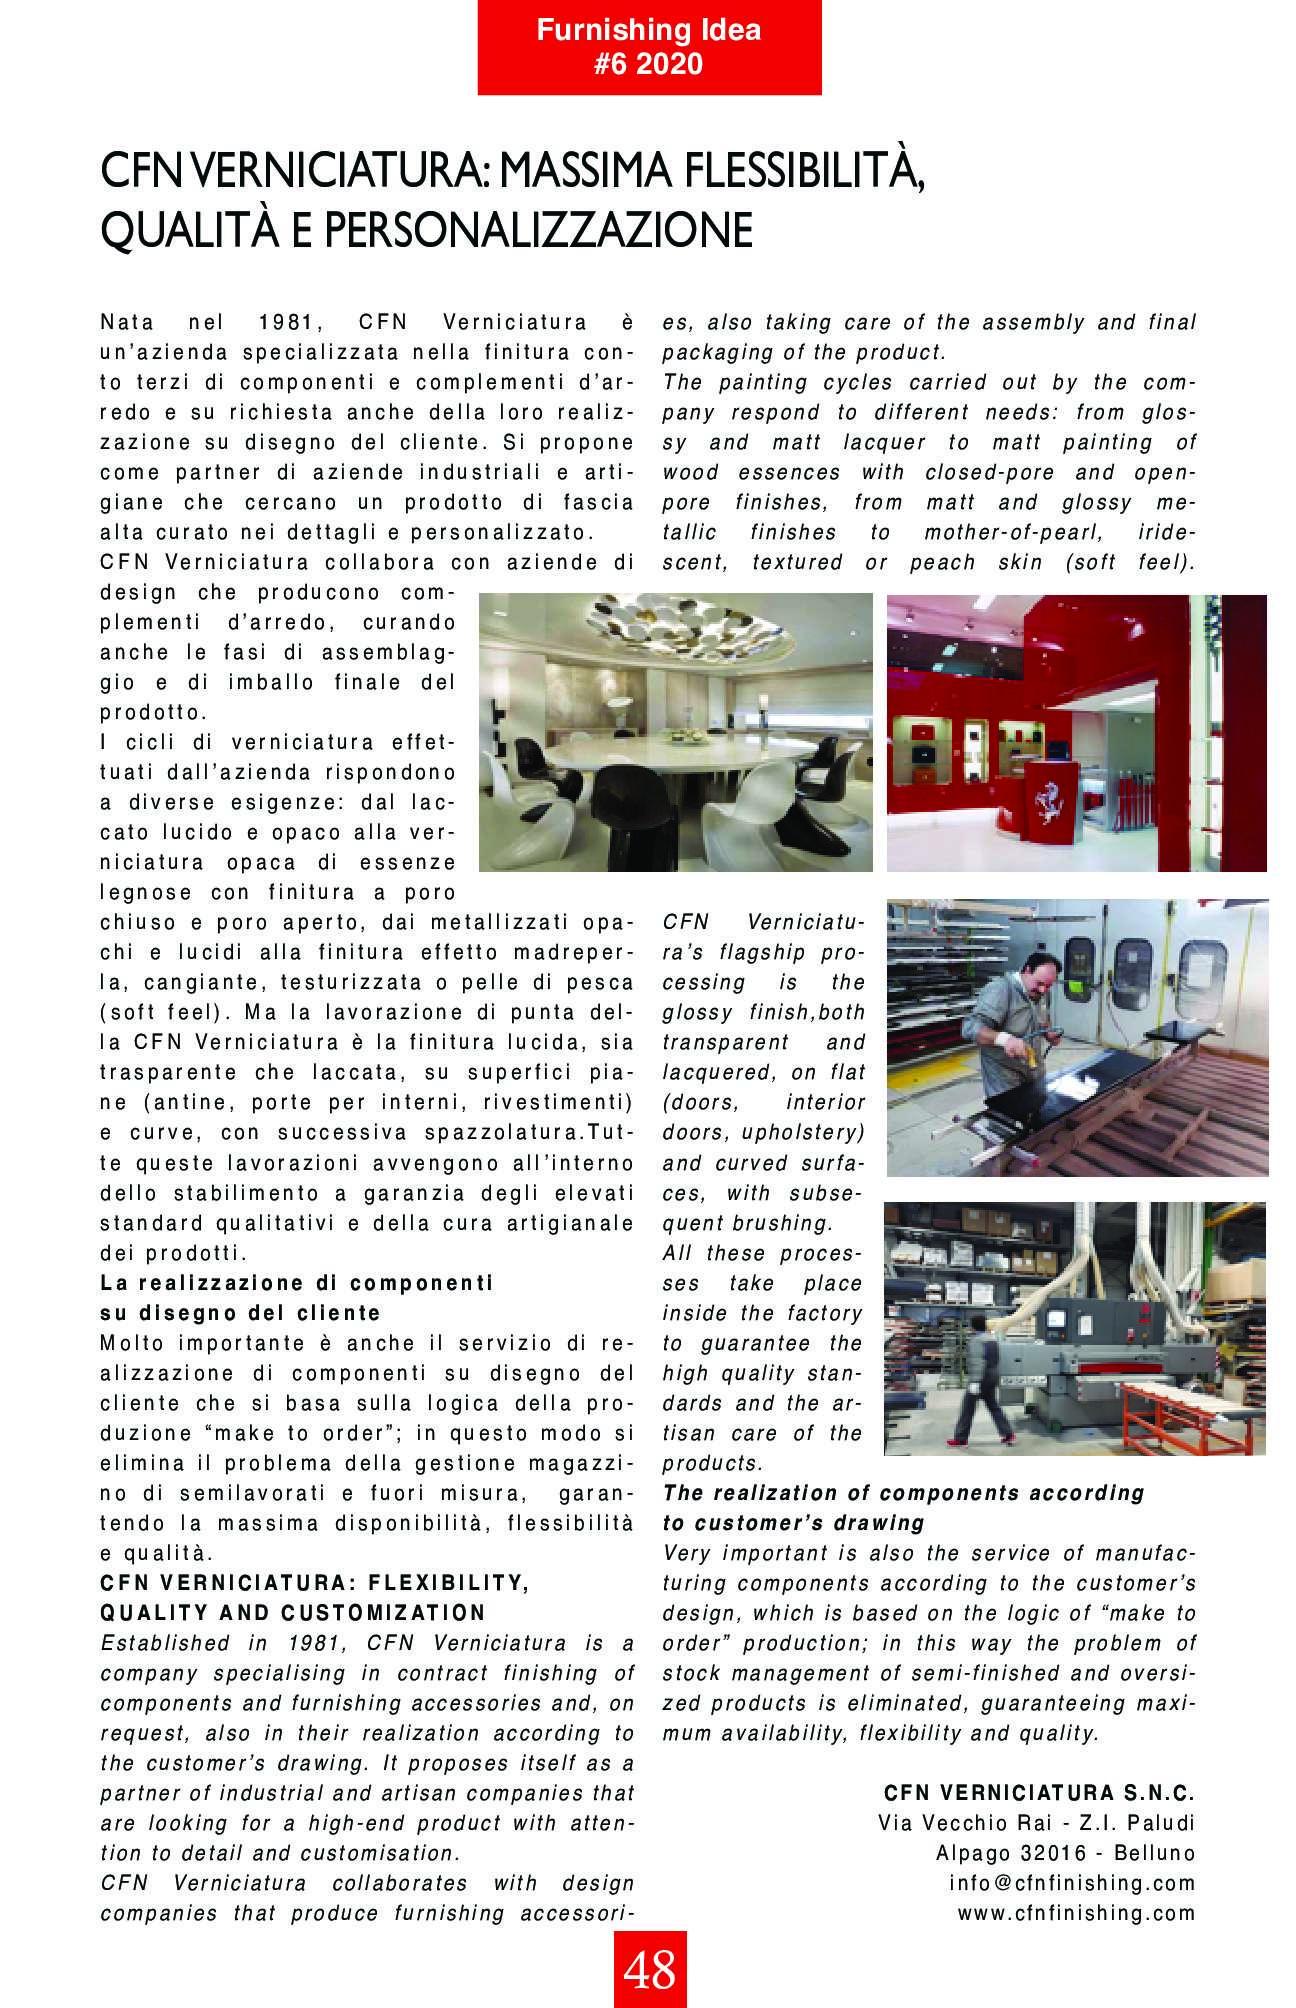 furnishingidea-6-2020_journal_22_047.jpg